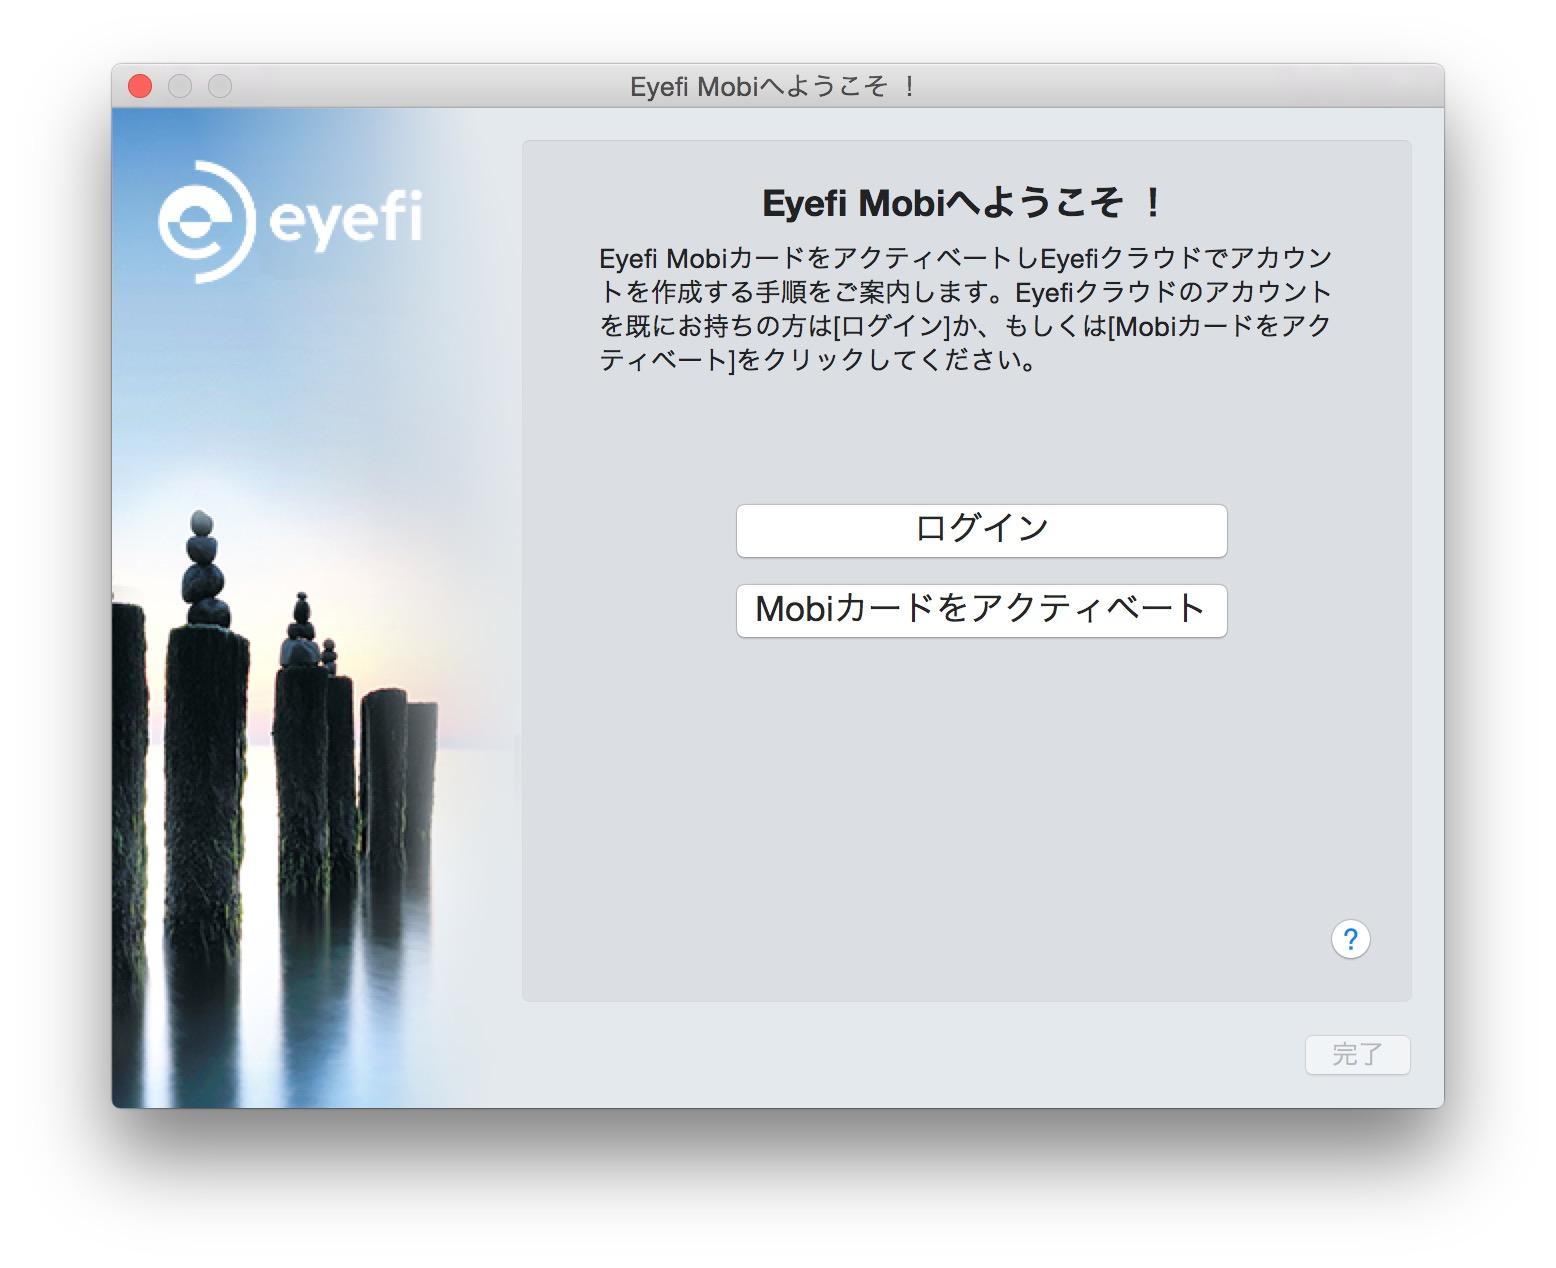 eyefimobi16gb008.jpg